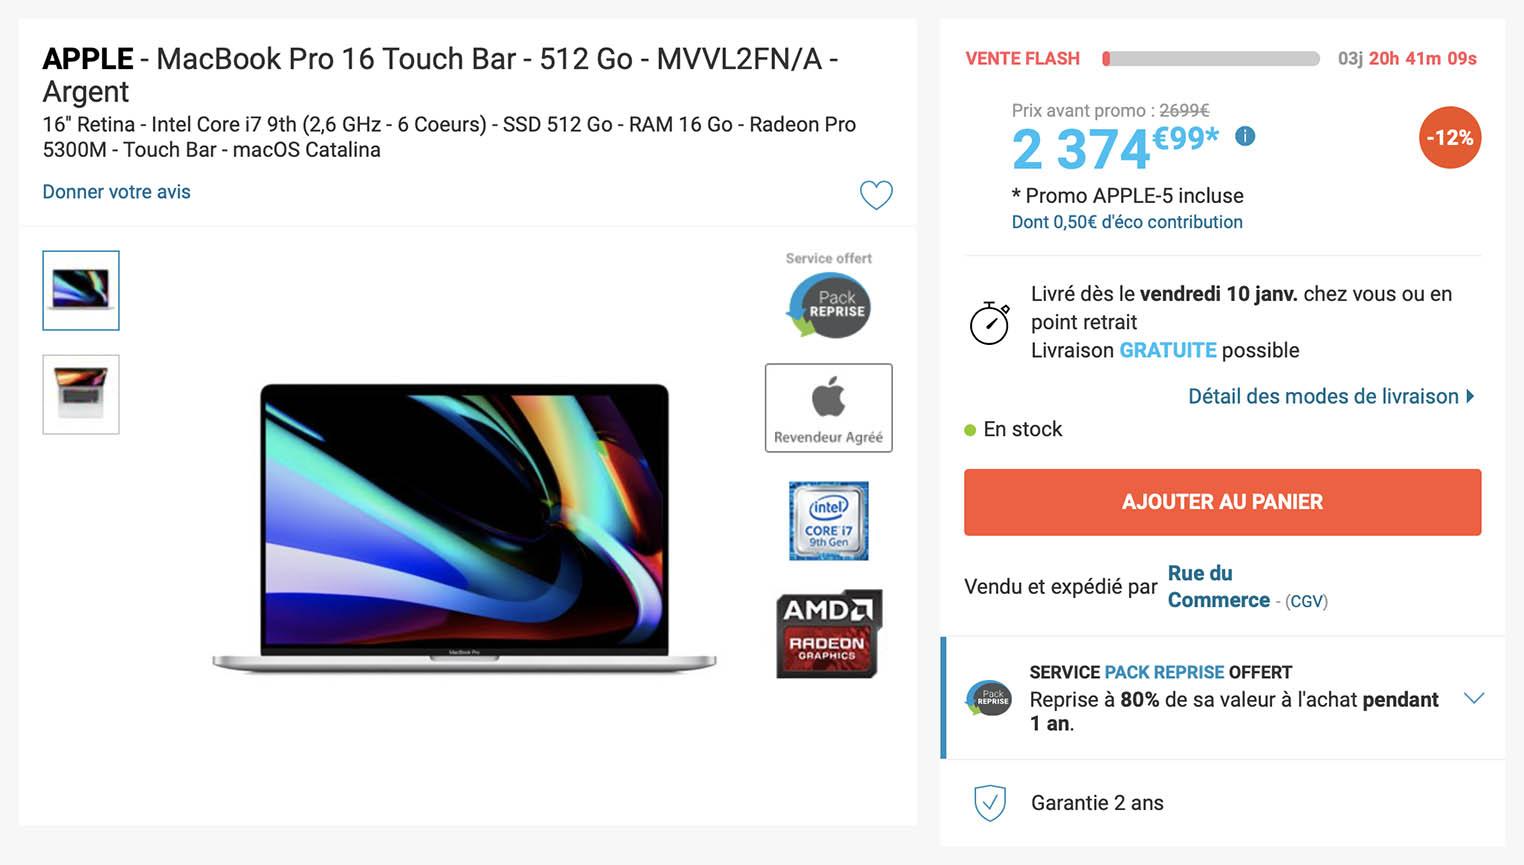 MacBook Pro 16 vente flash Rue du Commerce